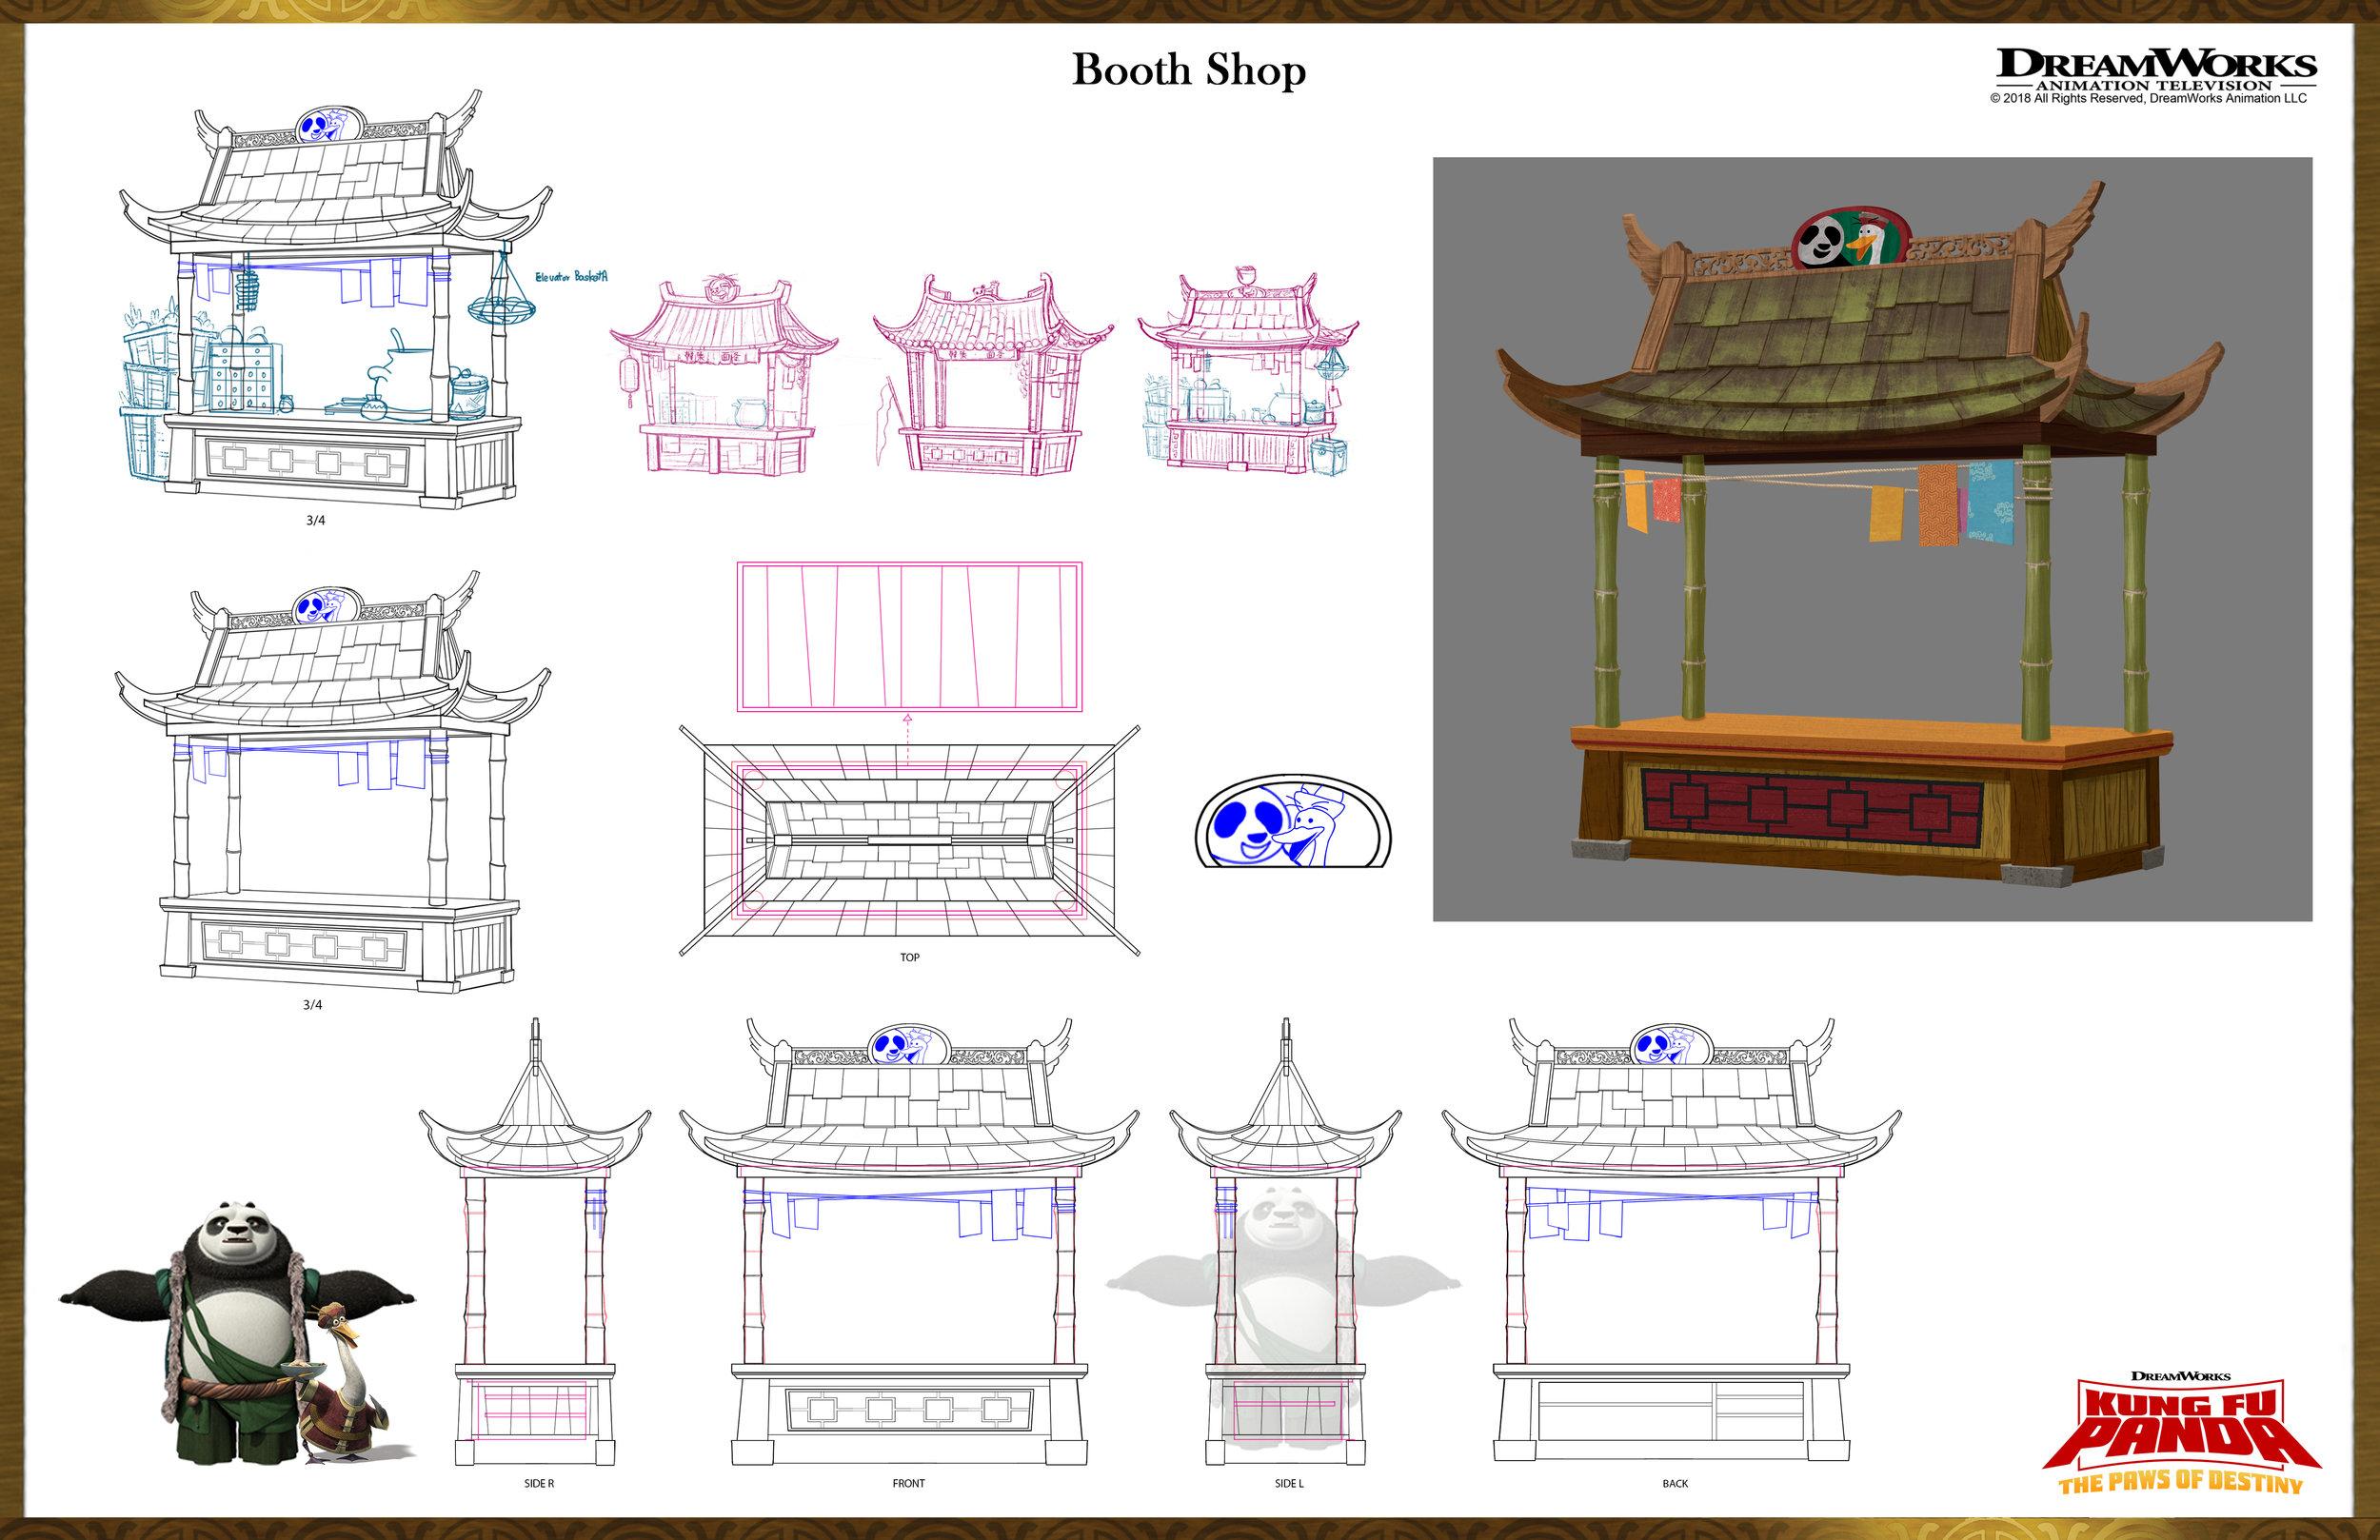 KFV_BoothShopA_Final_v001.jpg